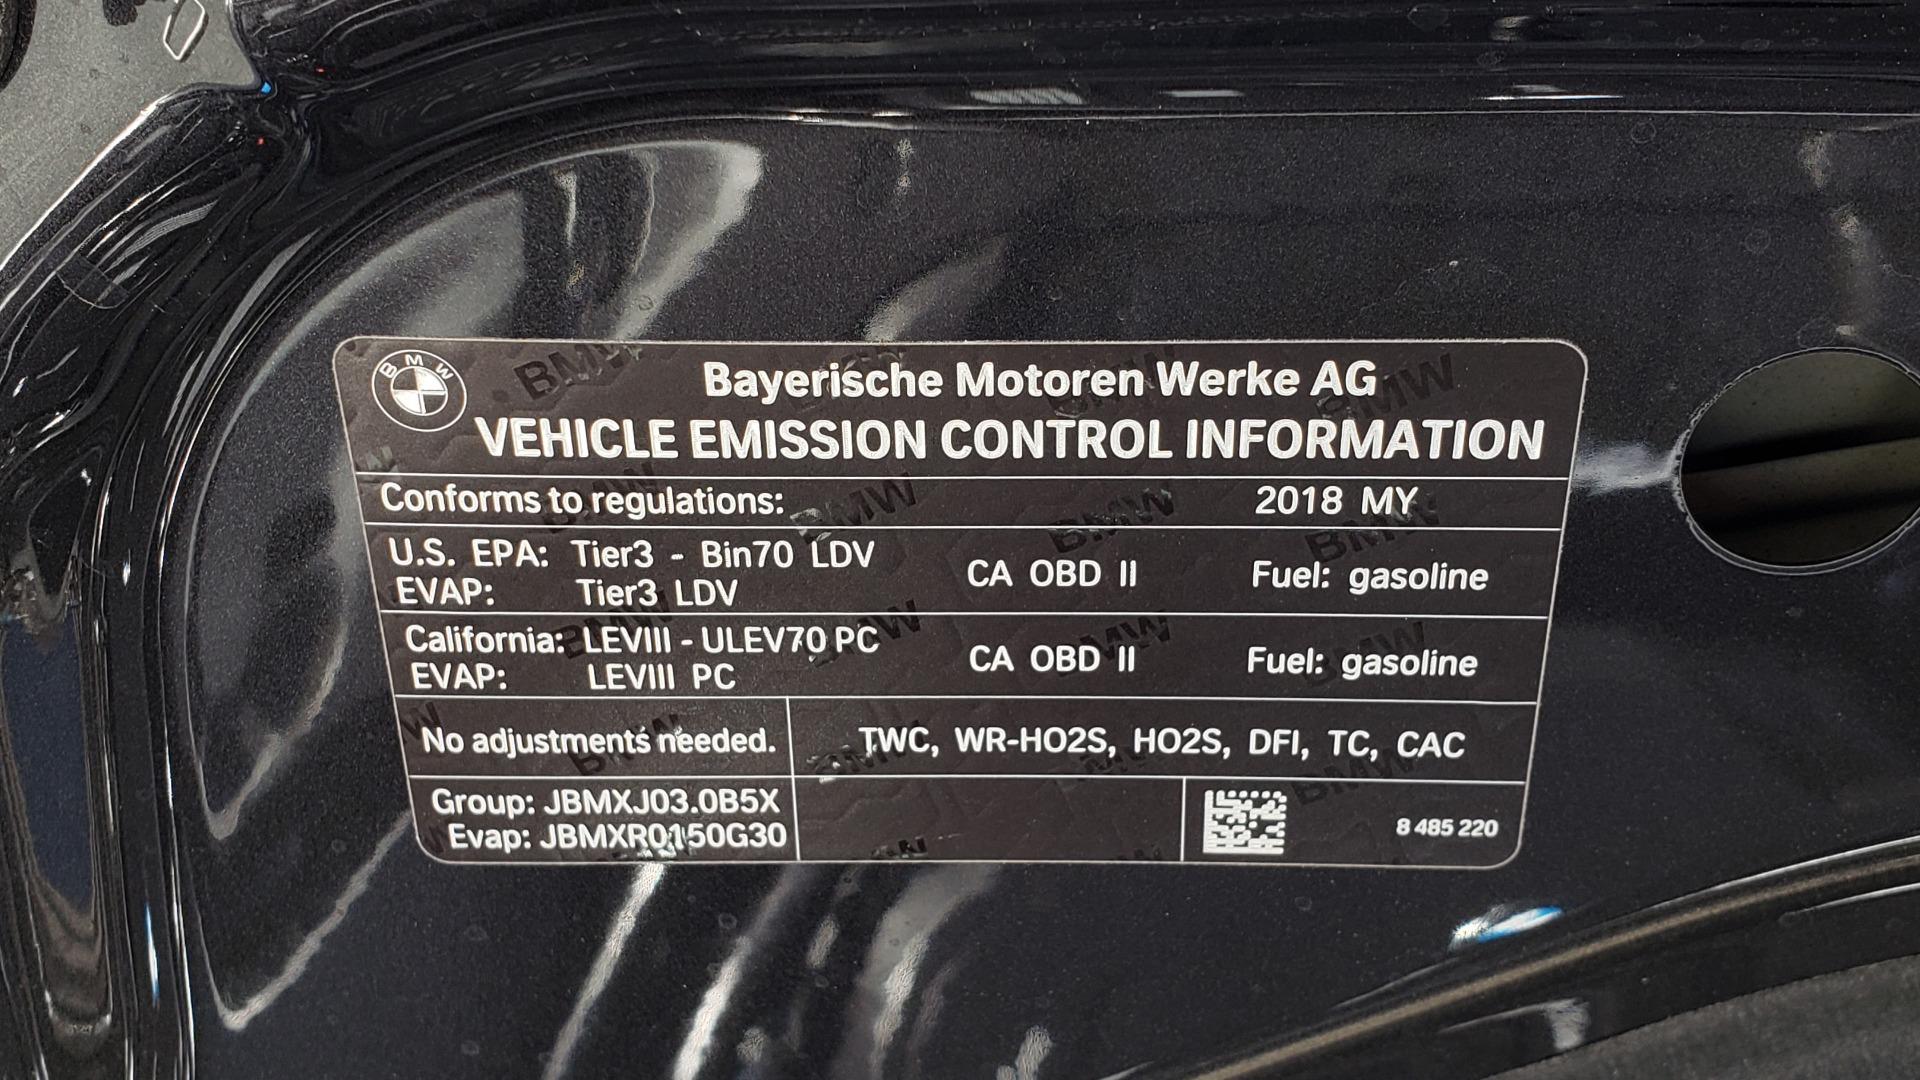 Used 2018 BMW 5 SERIES 540I M-SPORT / DRVR ASST / EXEC PKG / NAV / SUNROOF / HUD / REARVIEW for sale Sold at Formula Imports in Charlotte NC 28227 14